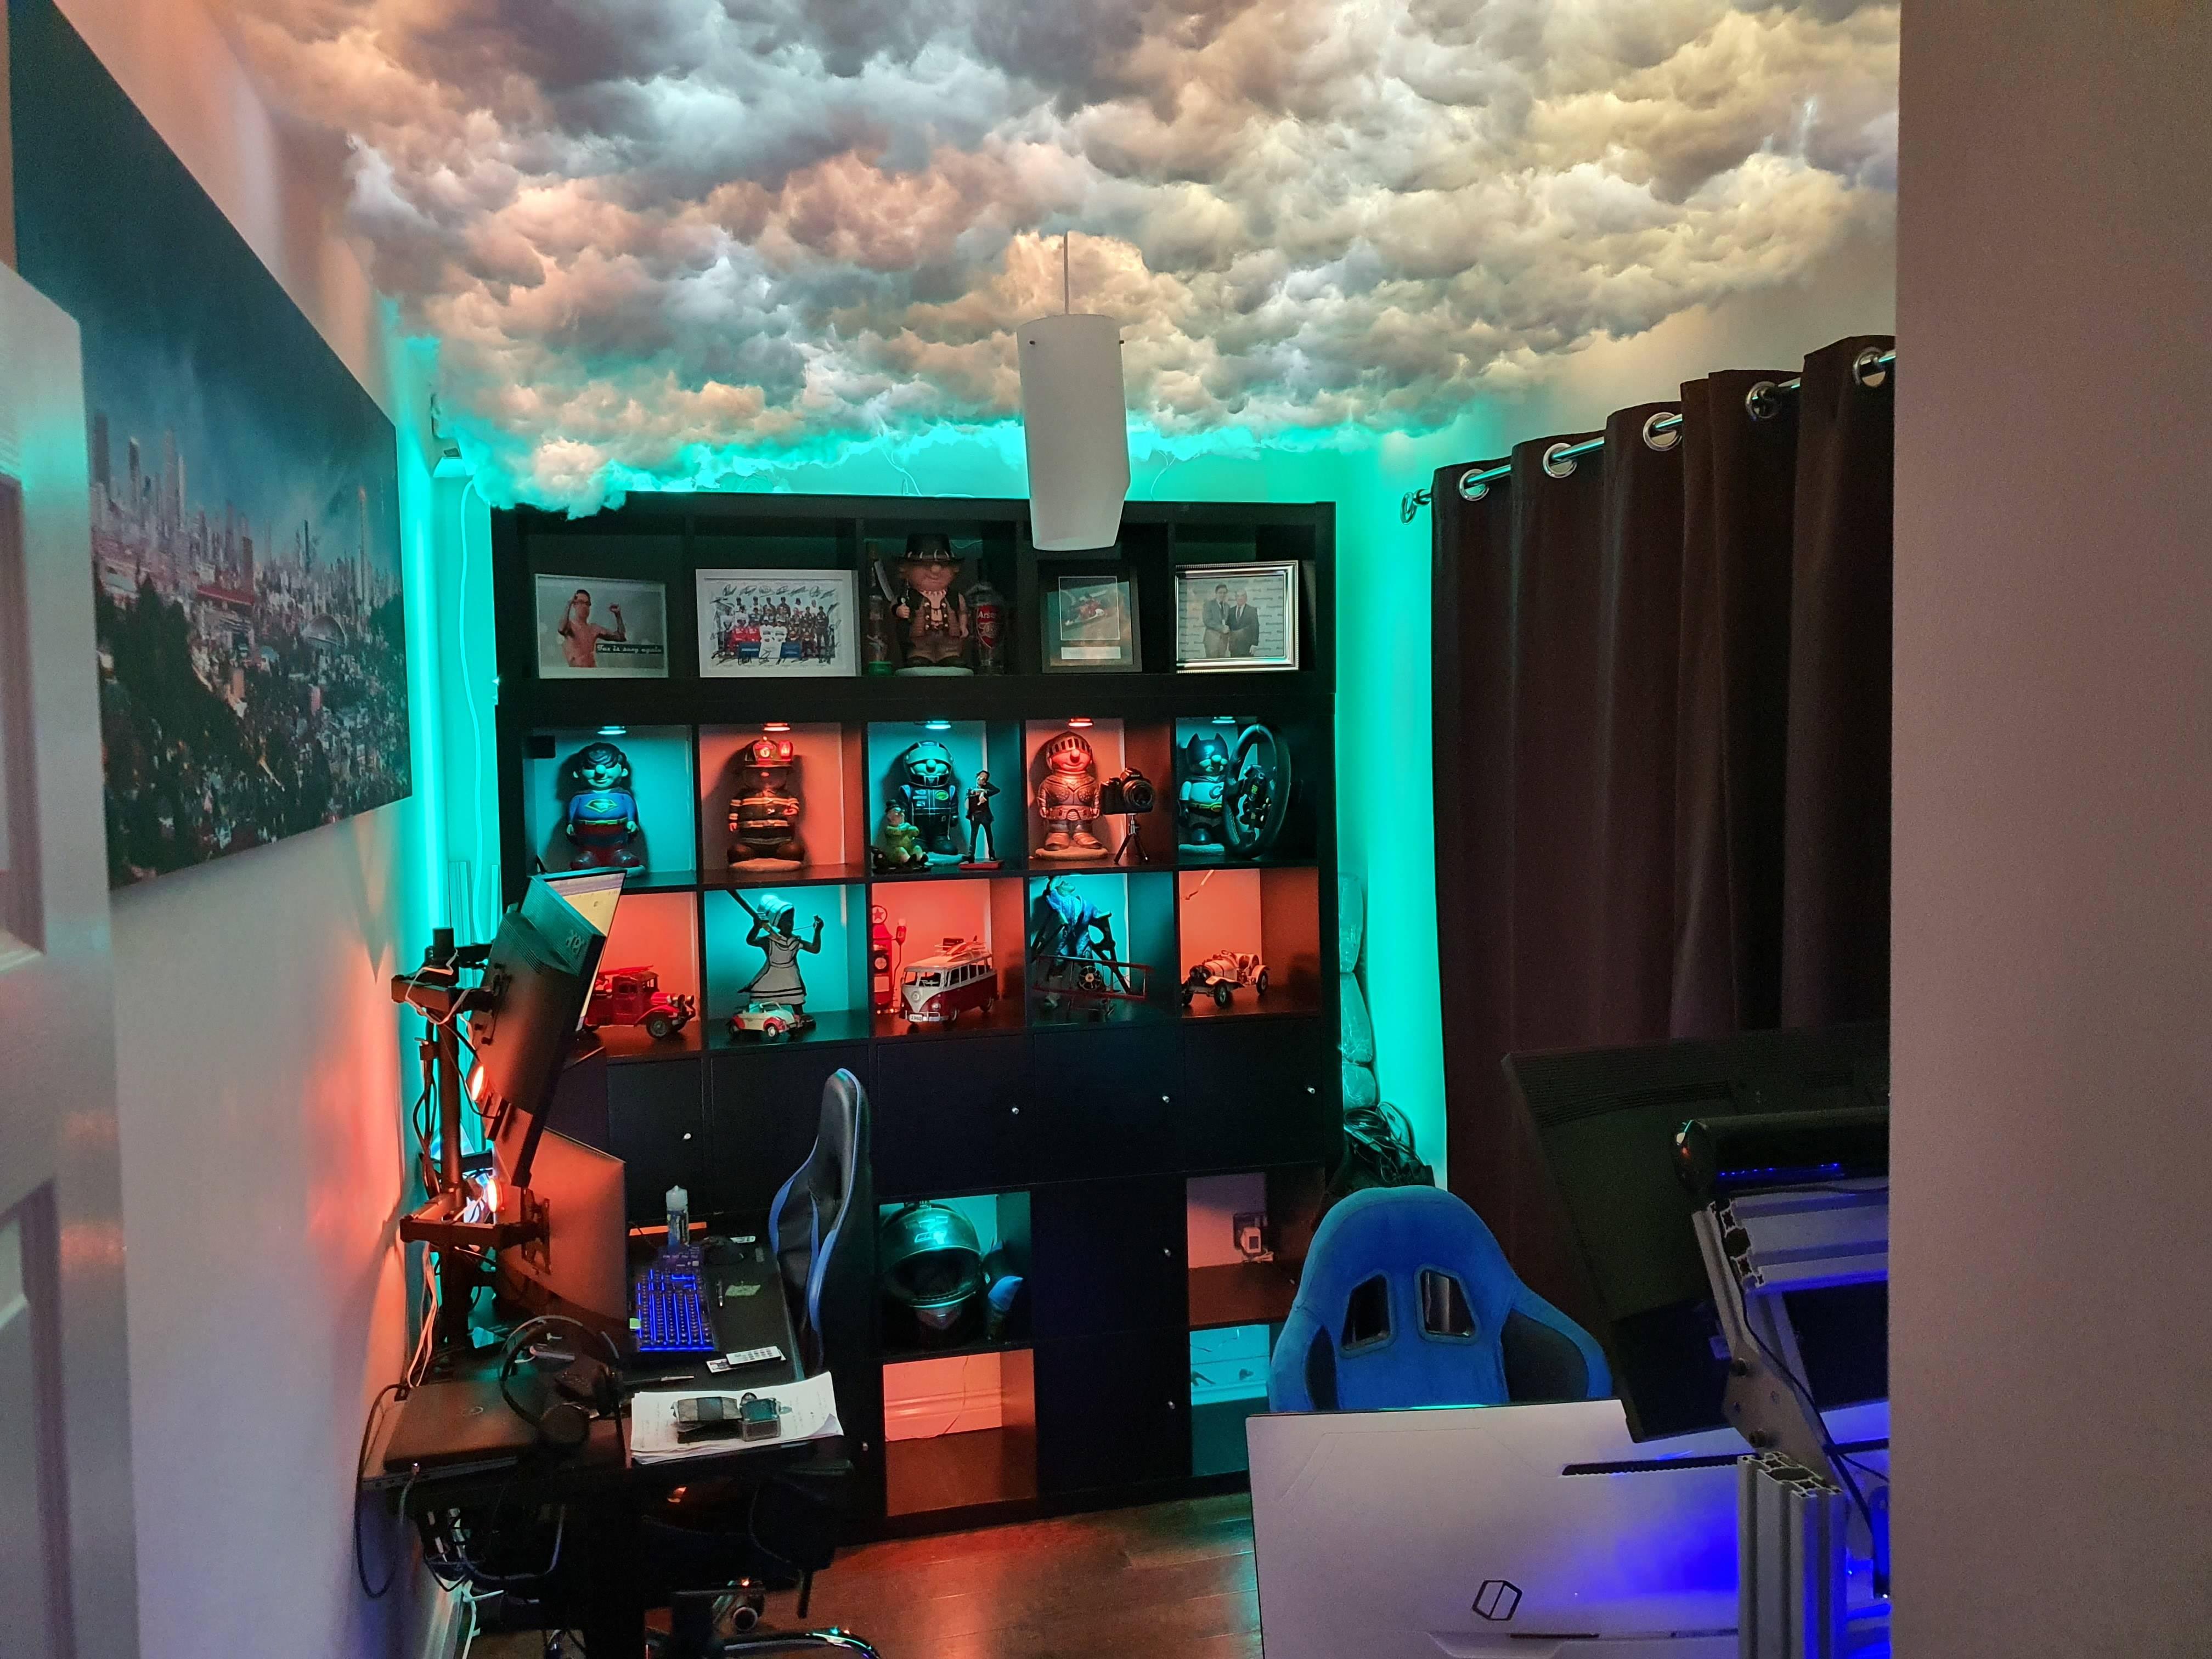 jpcjrracing's Setup - Gaming Room | Scooget